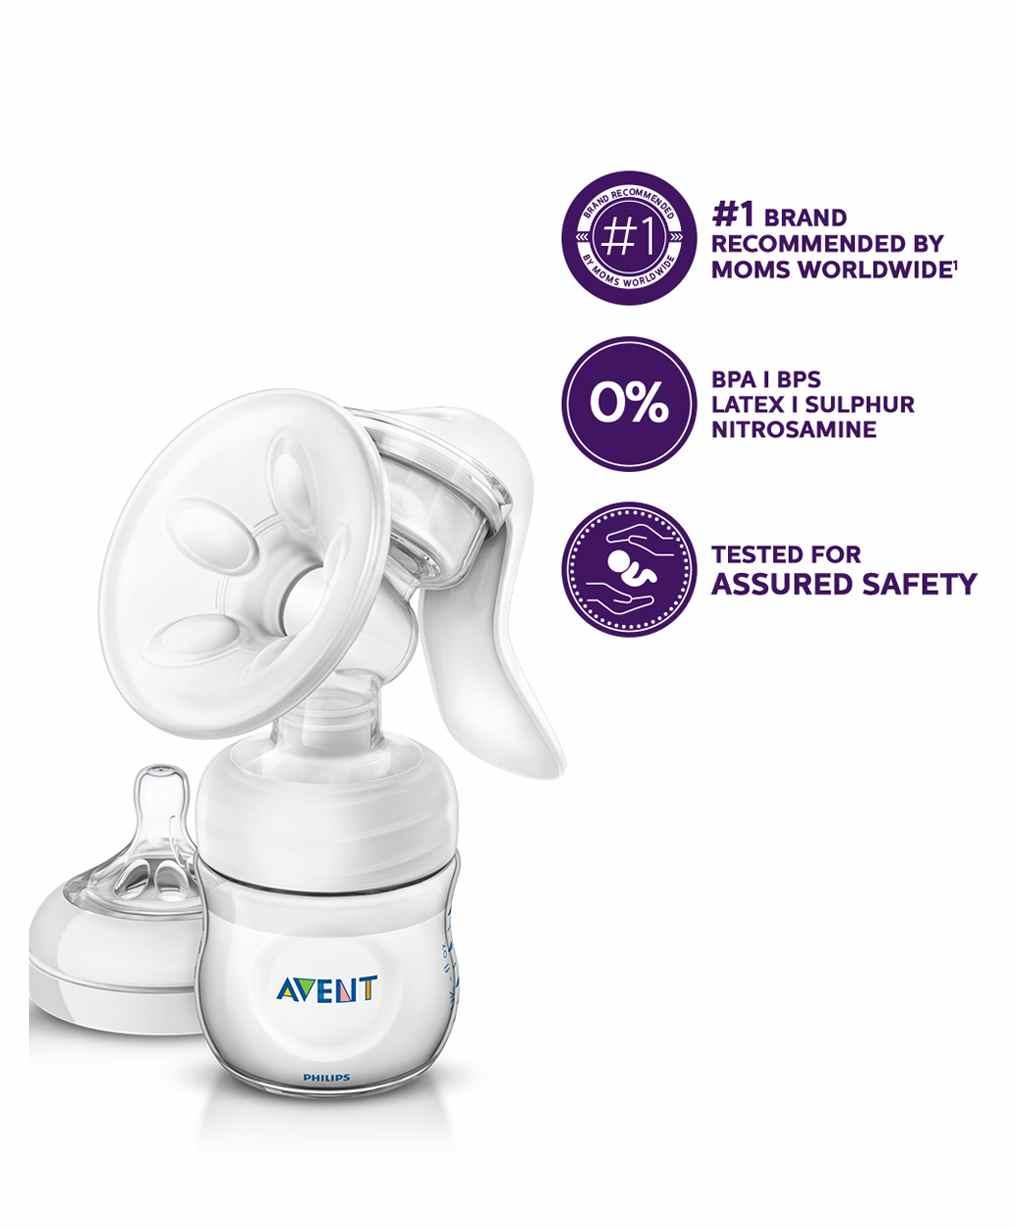 Avent Comfort Manual Breast Pump Online In India Buy At Best Price Philips New Natural Skin Soft Nipple 2 Pack Medium Flow 3m Small Of 20924 Per Diaper